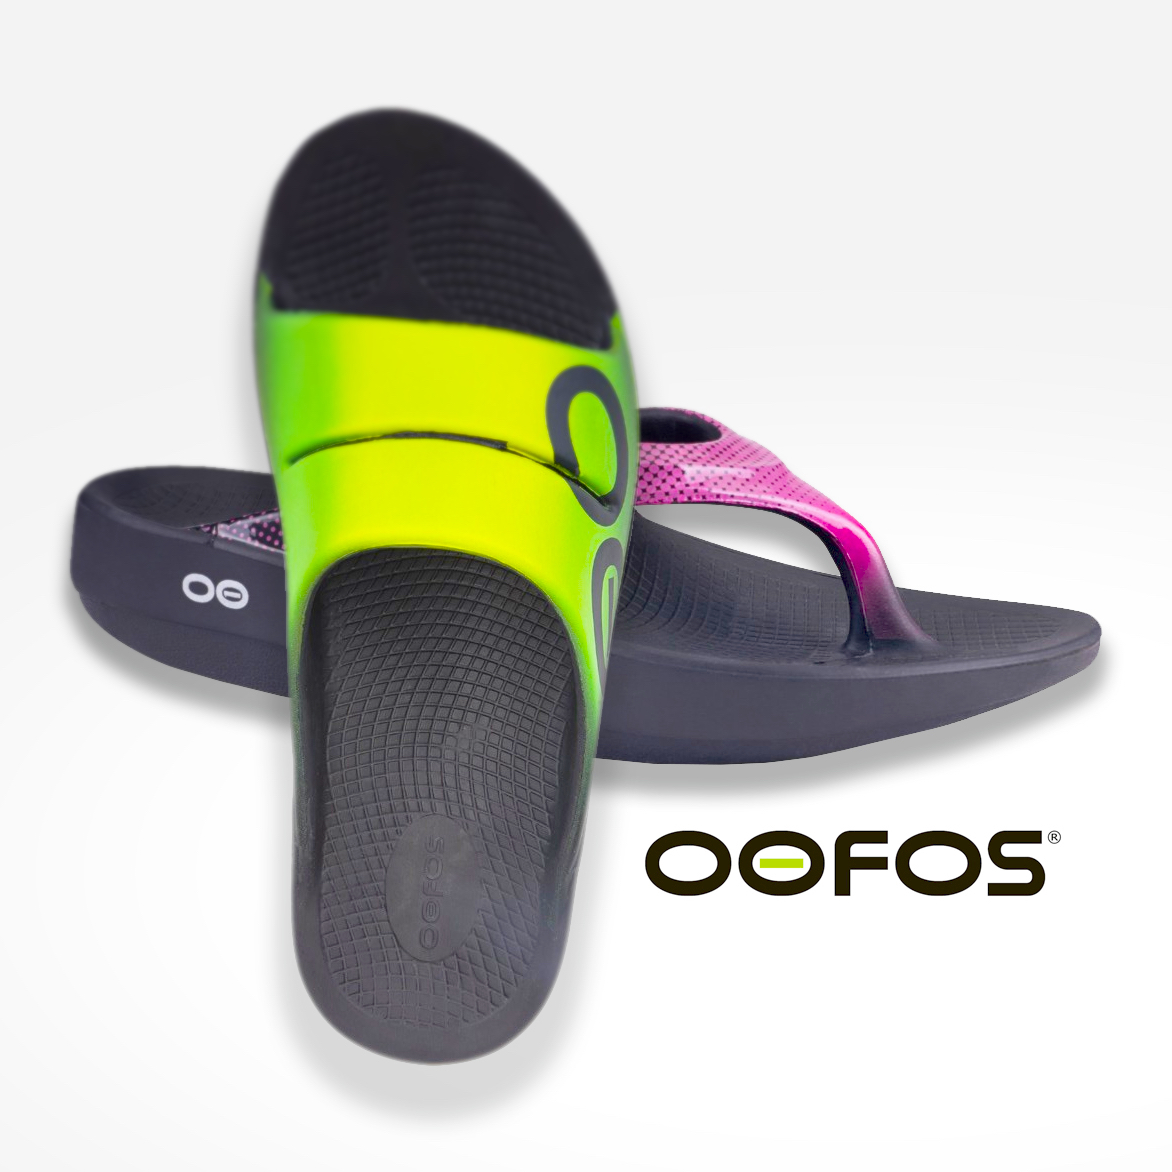 OOFOS_overlap_062519.jpeg